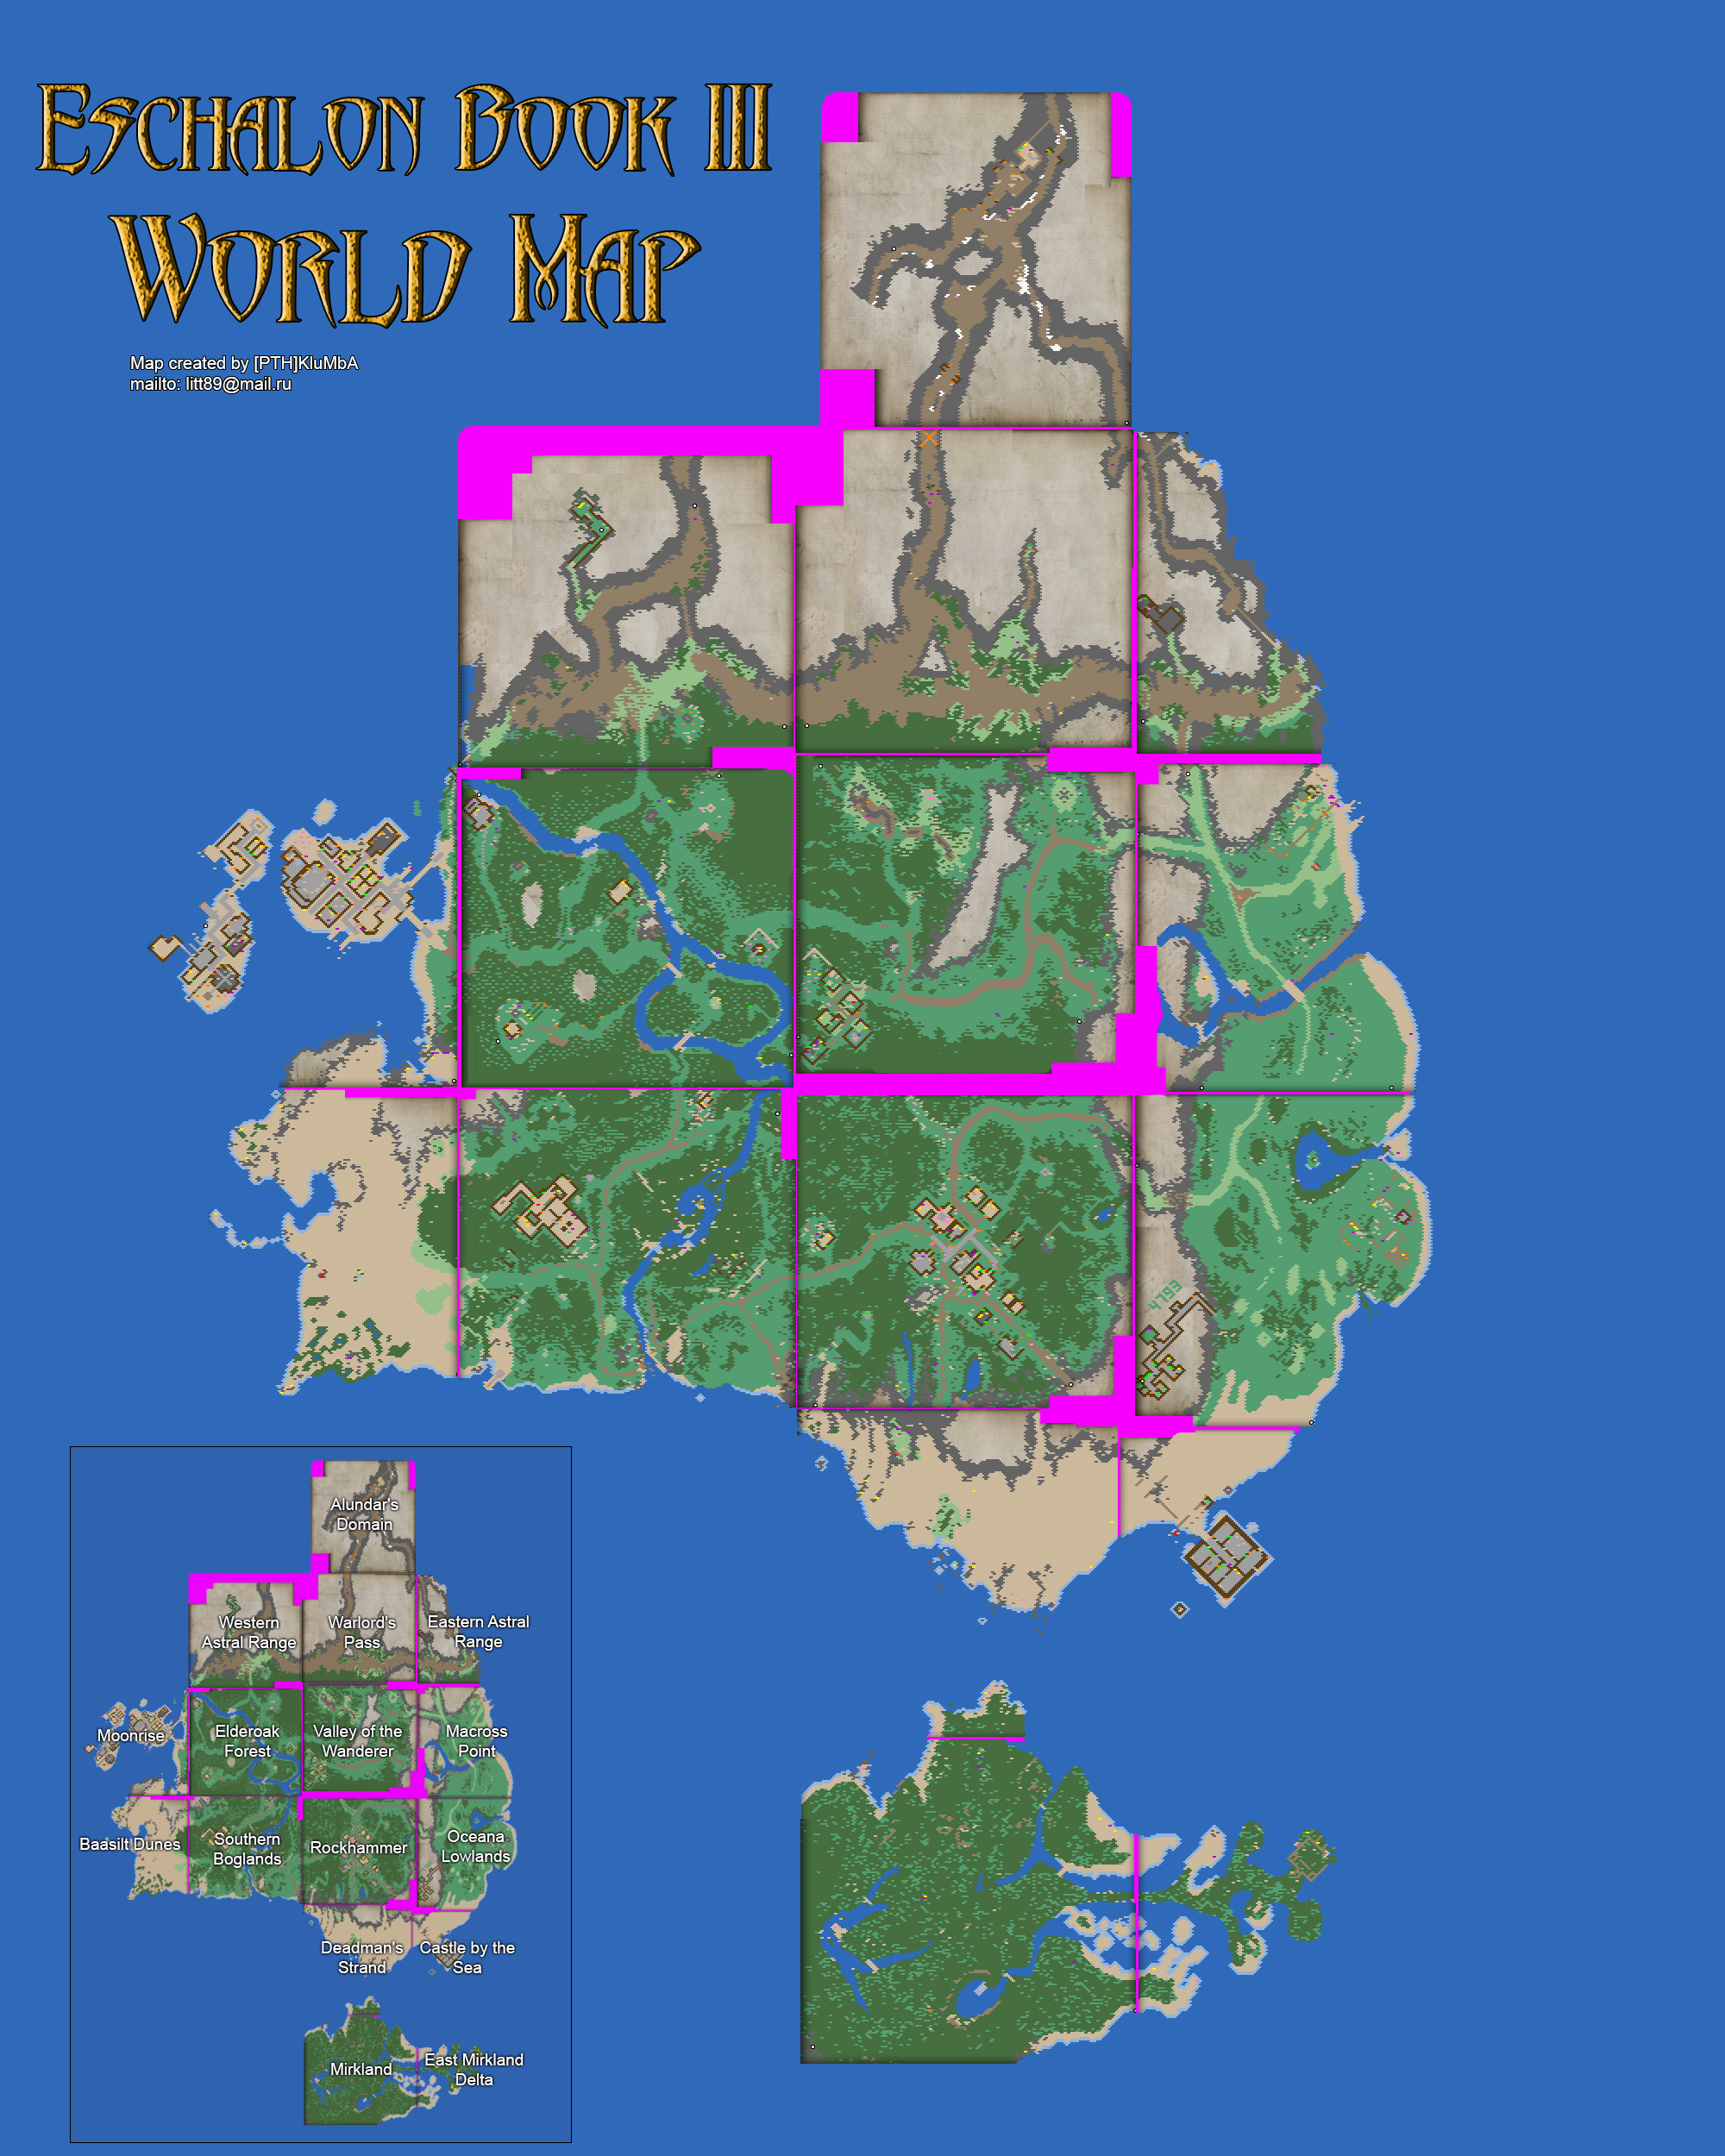 Eschalon book 3 world map eschalon rpg wiki fandom powered by wikia eschalon book 3 world map gumiabroncs Image collections